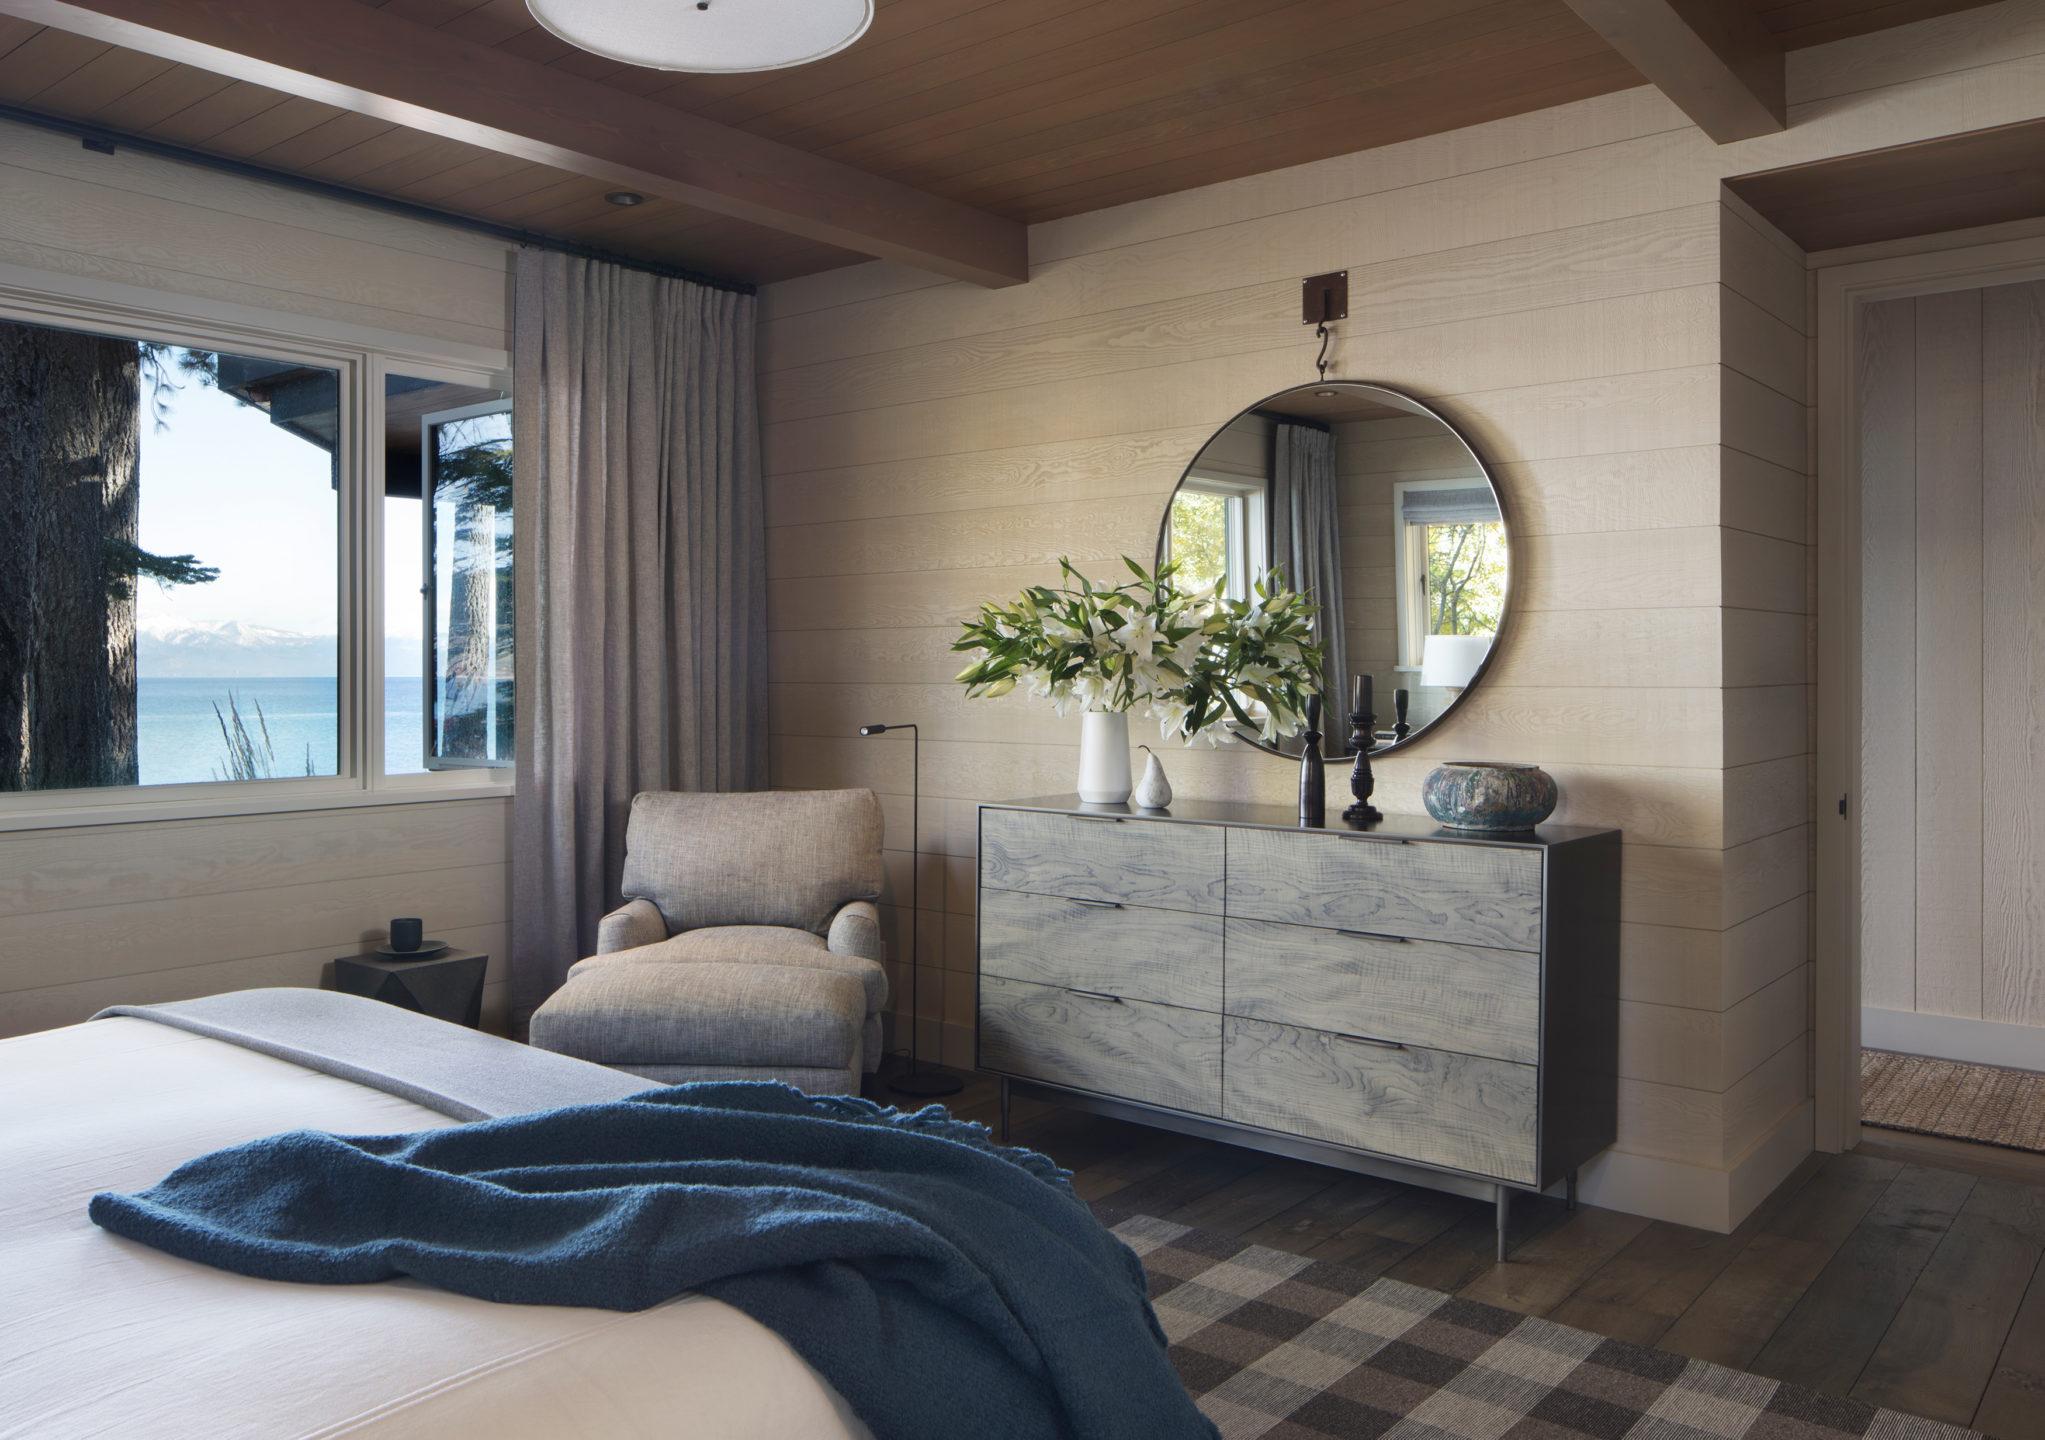 Jennifer_robins_interiors_projects_lake_tahoe_Leupold_19_off_bedroom_BR